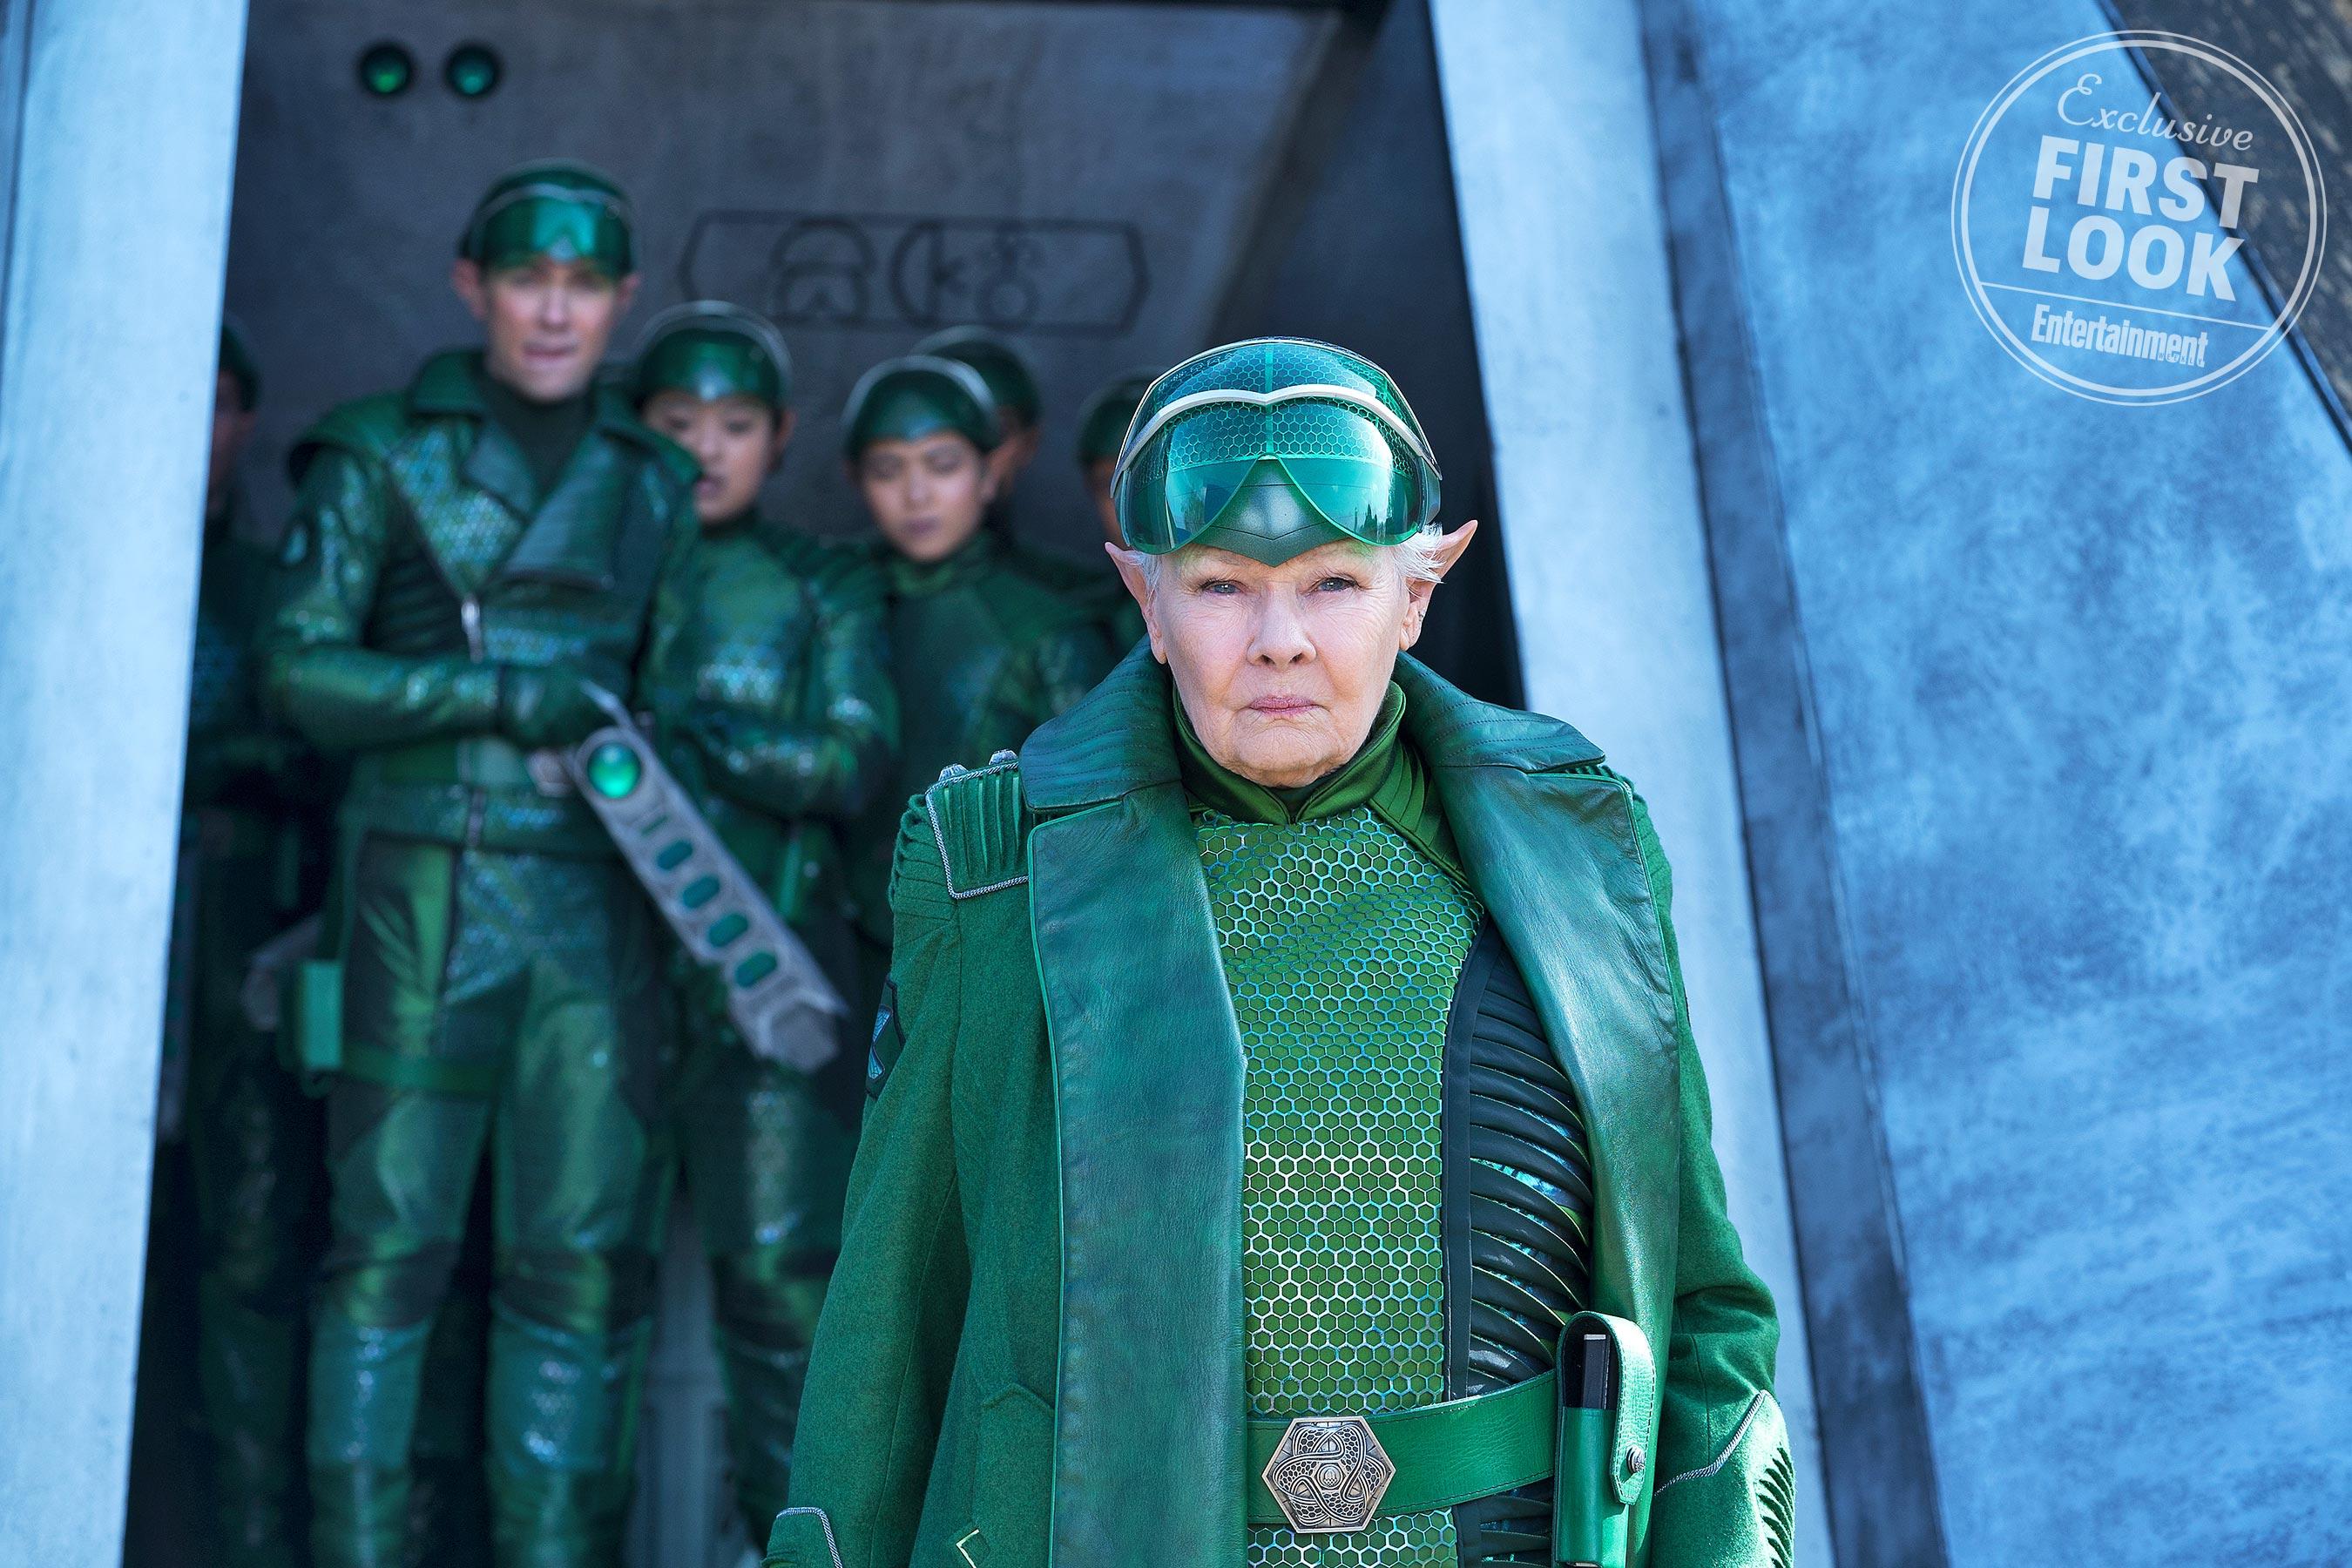 Artemis Fowl Image: First Look at Judi Dench as Commander